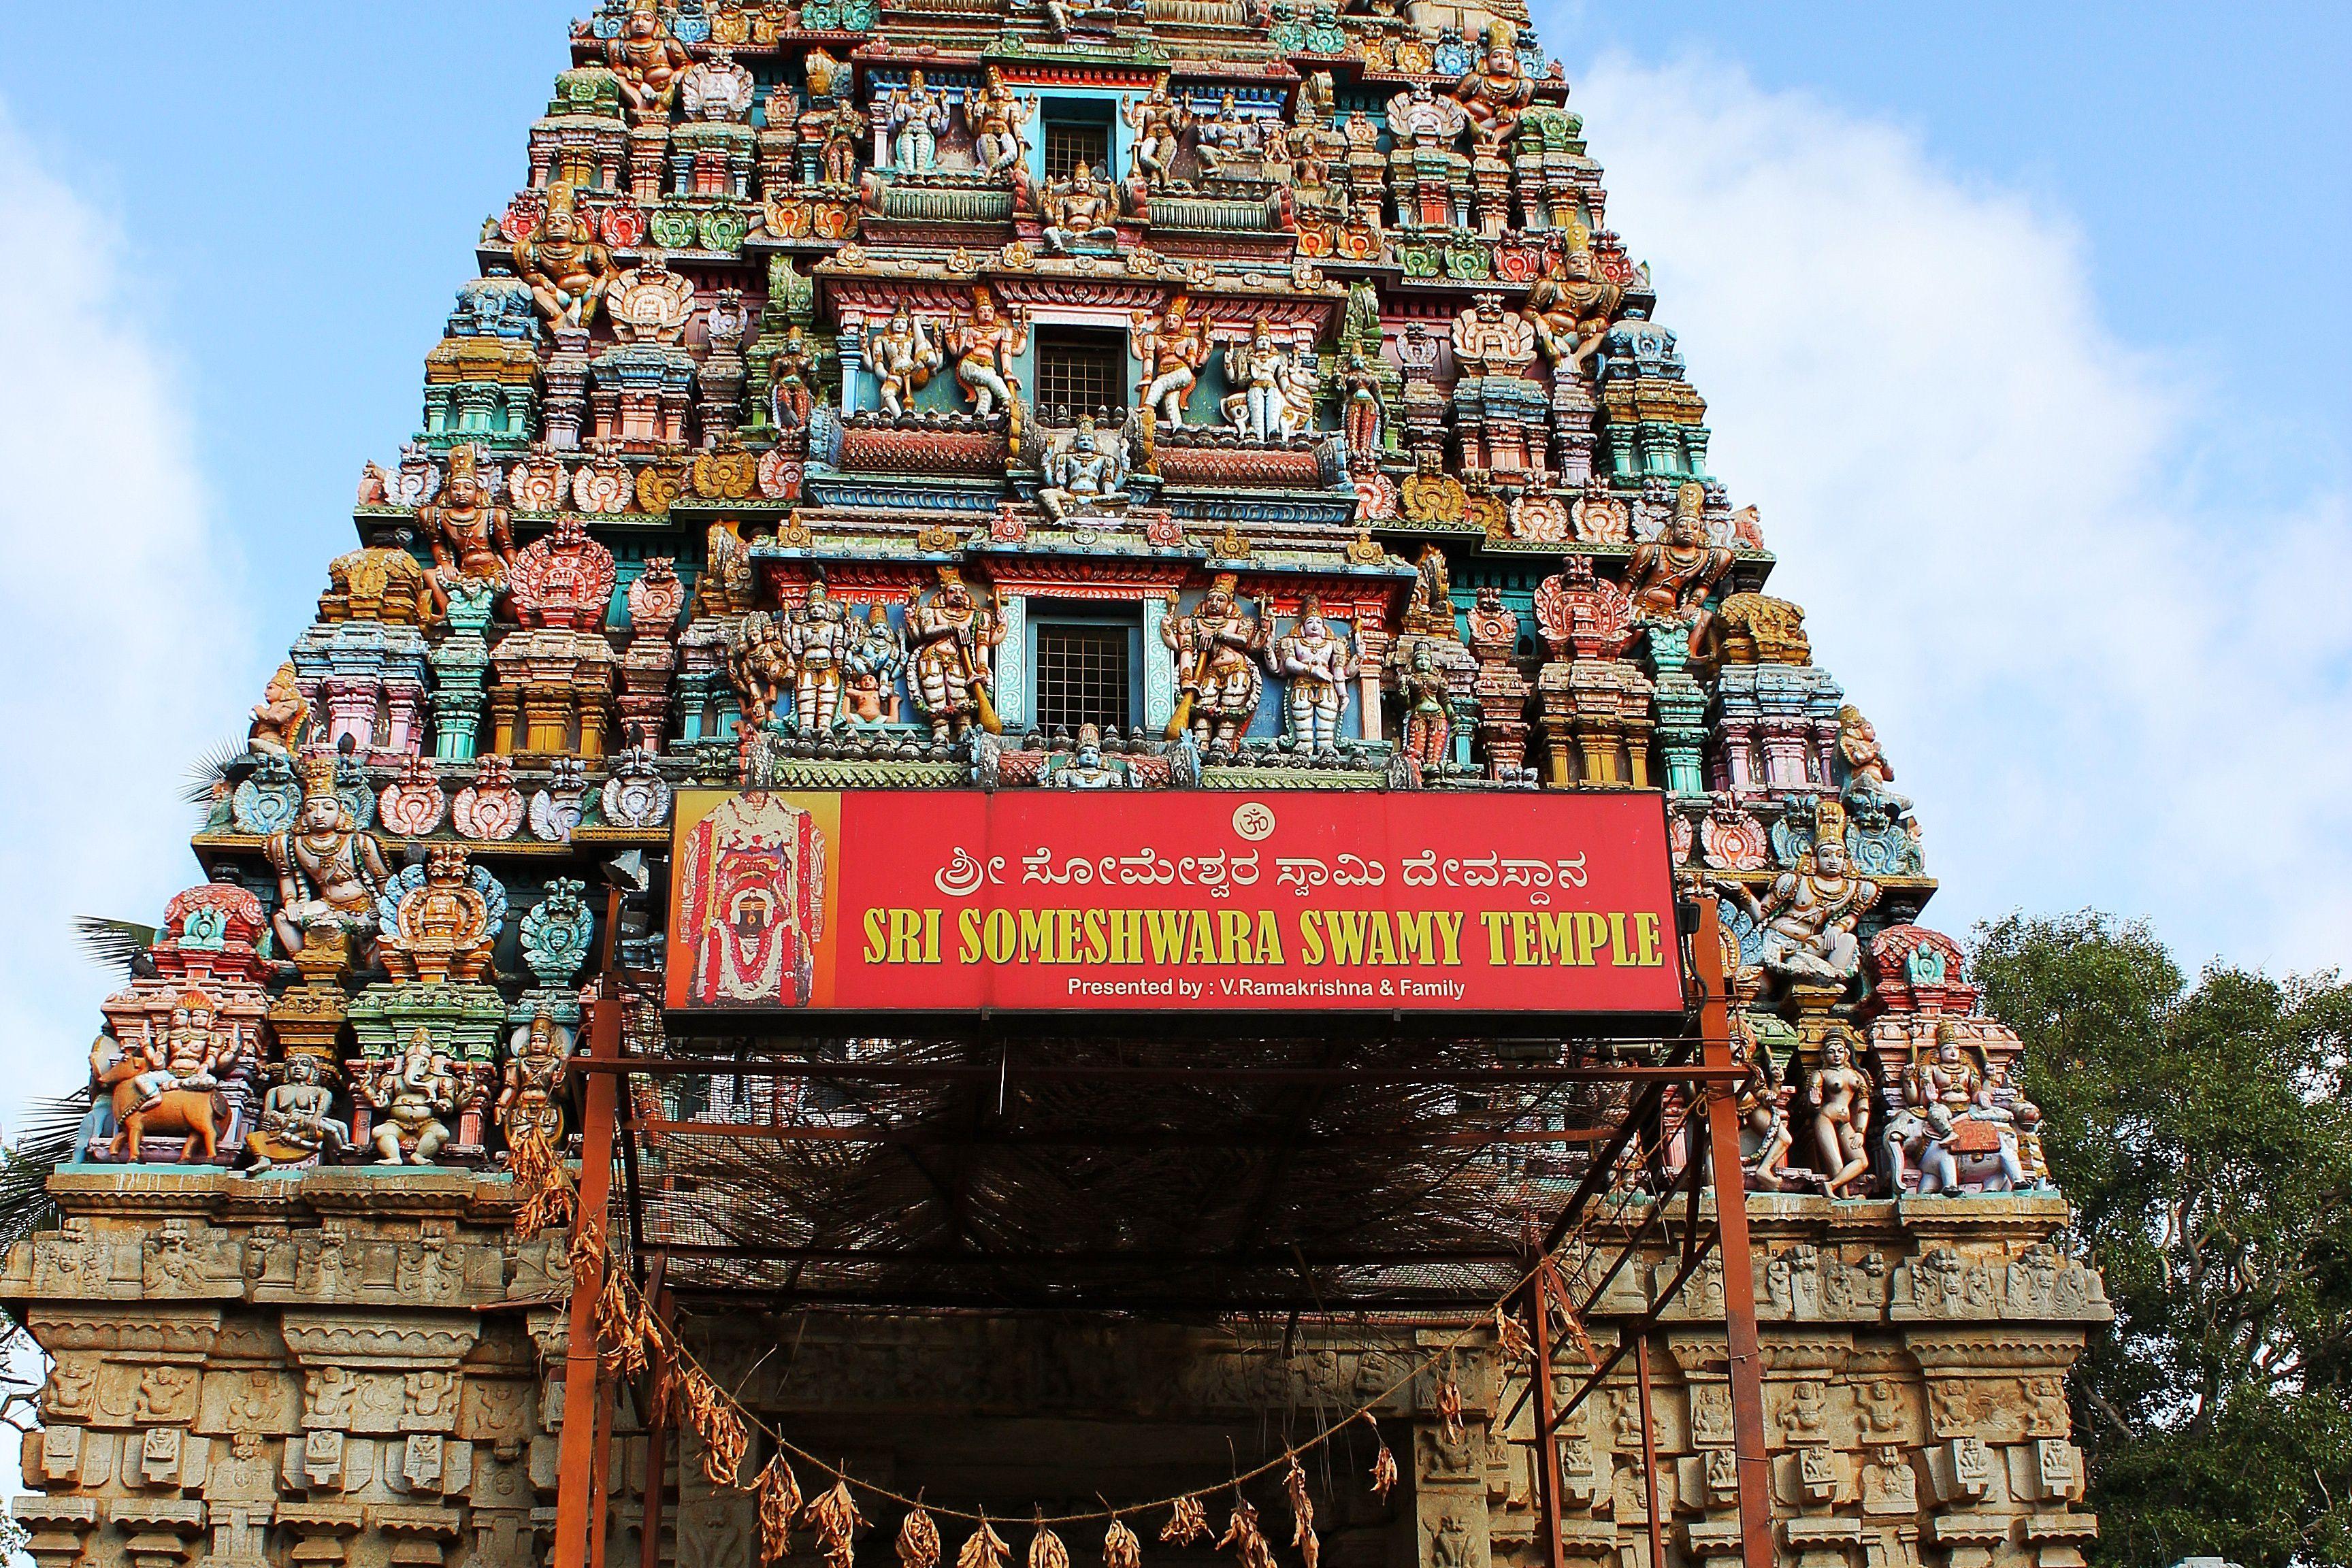 The entrance of Someshwara temple